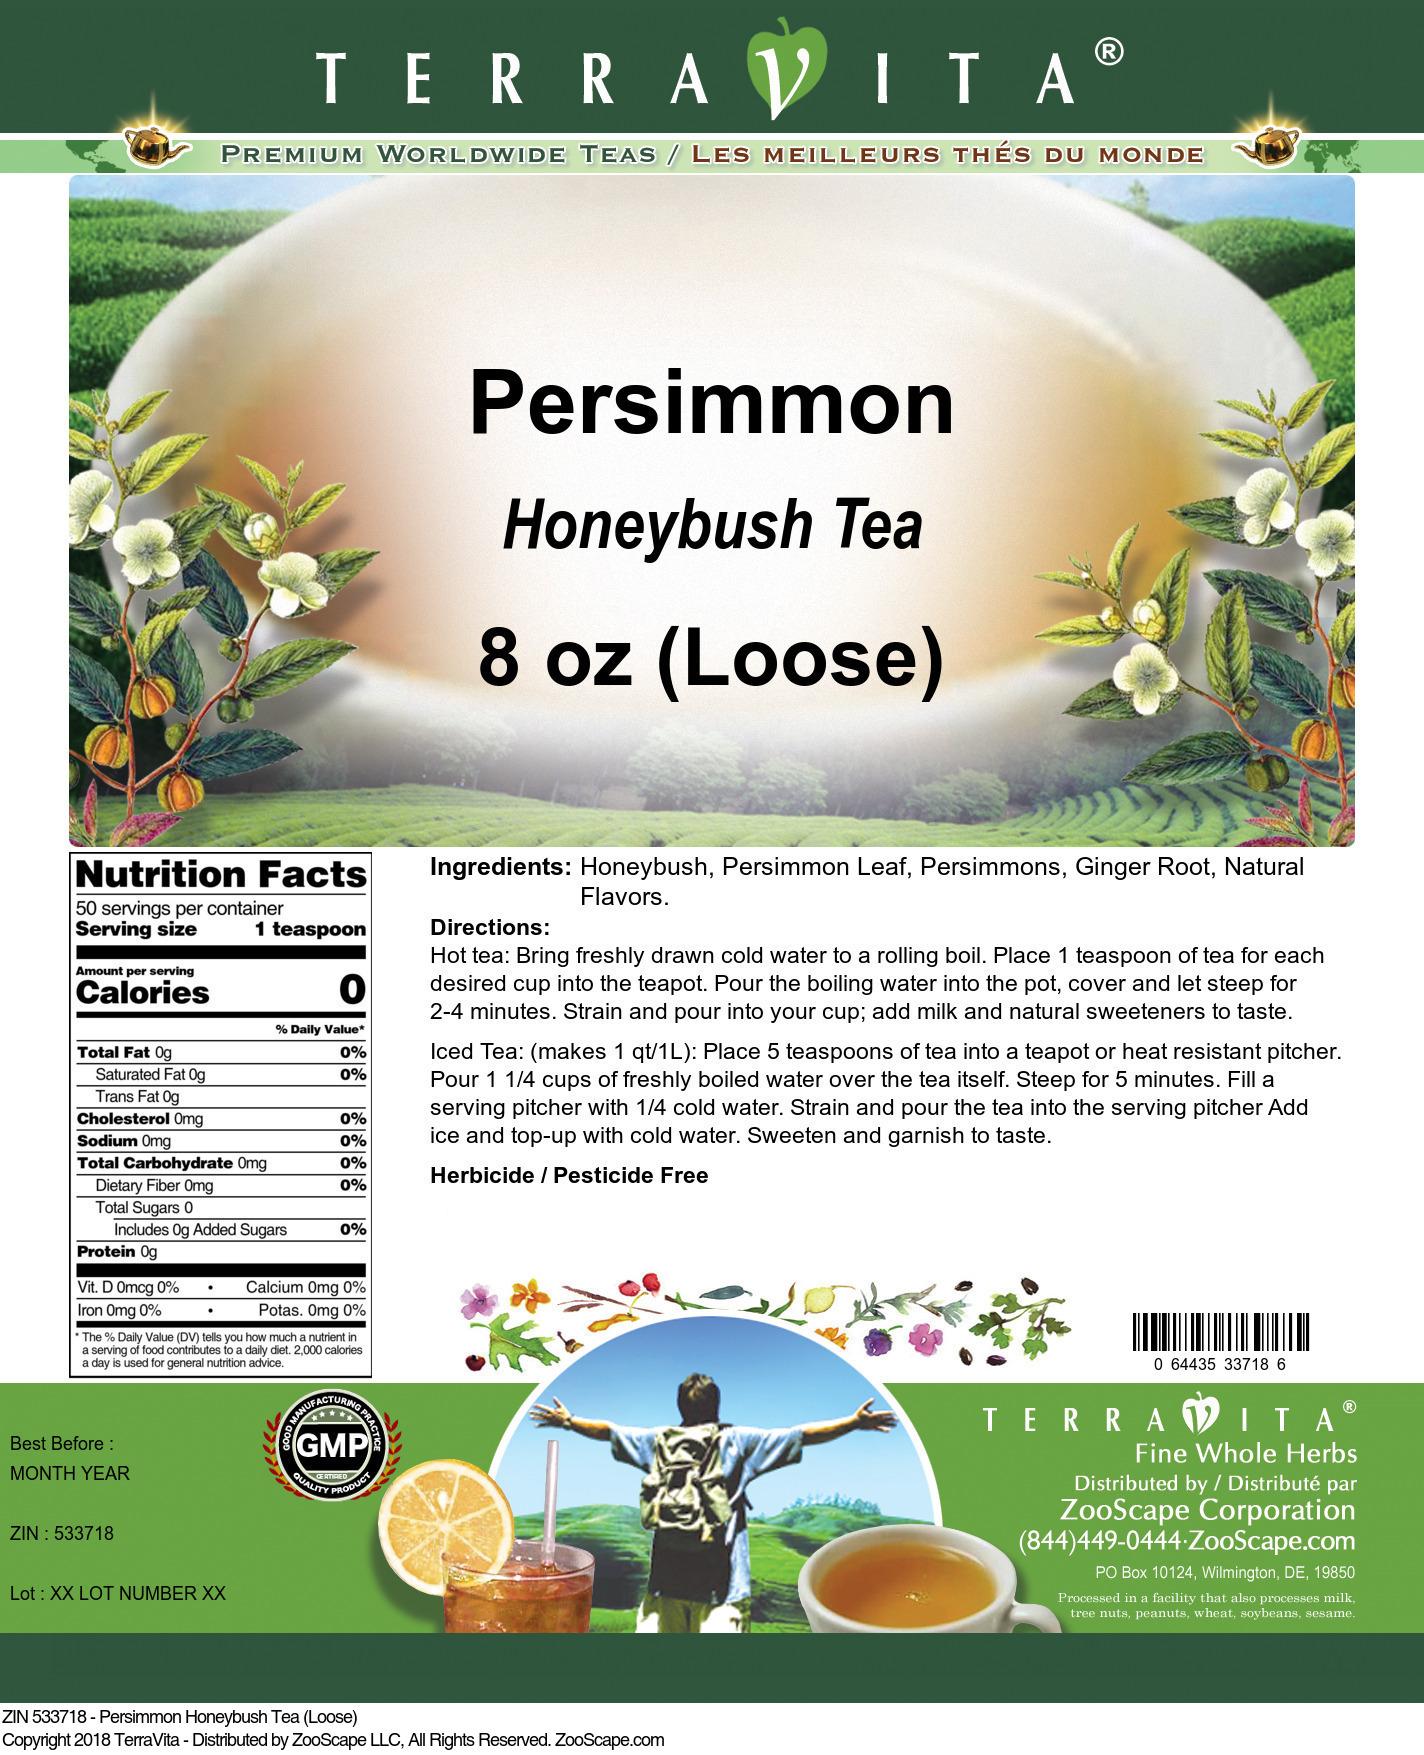 Persimmon Honeybush Tea